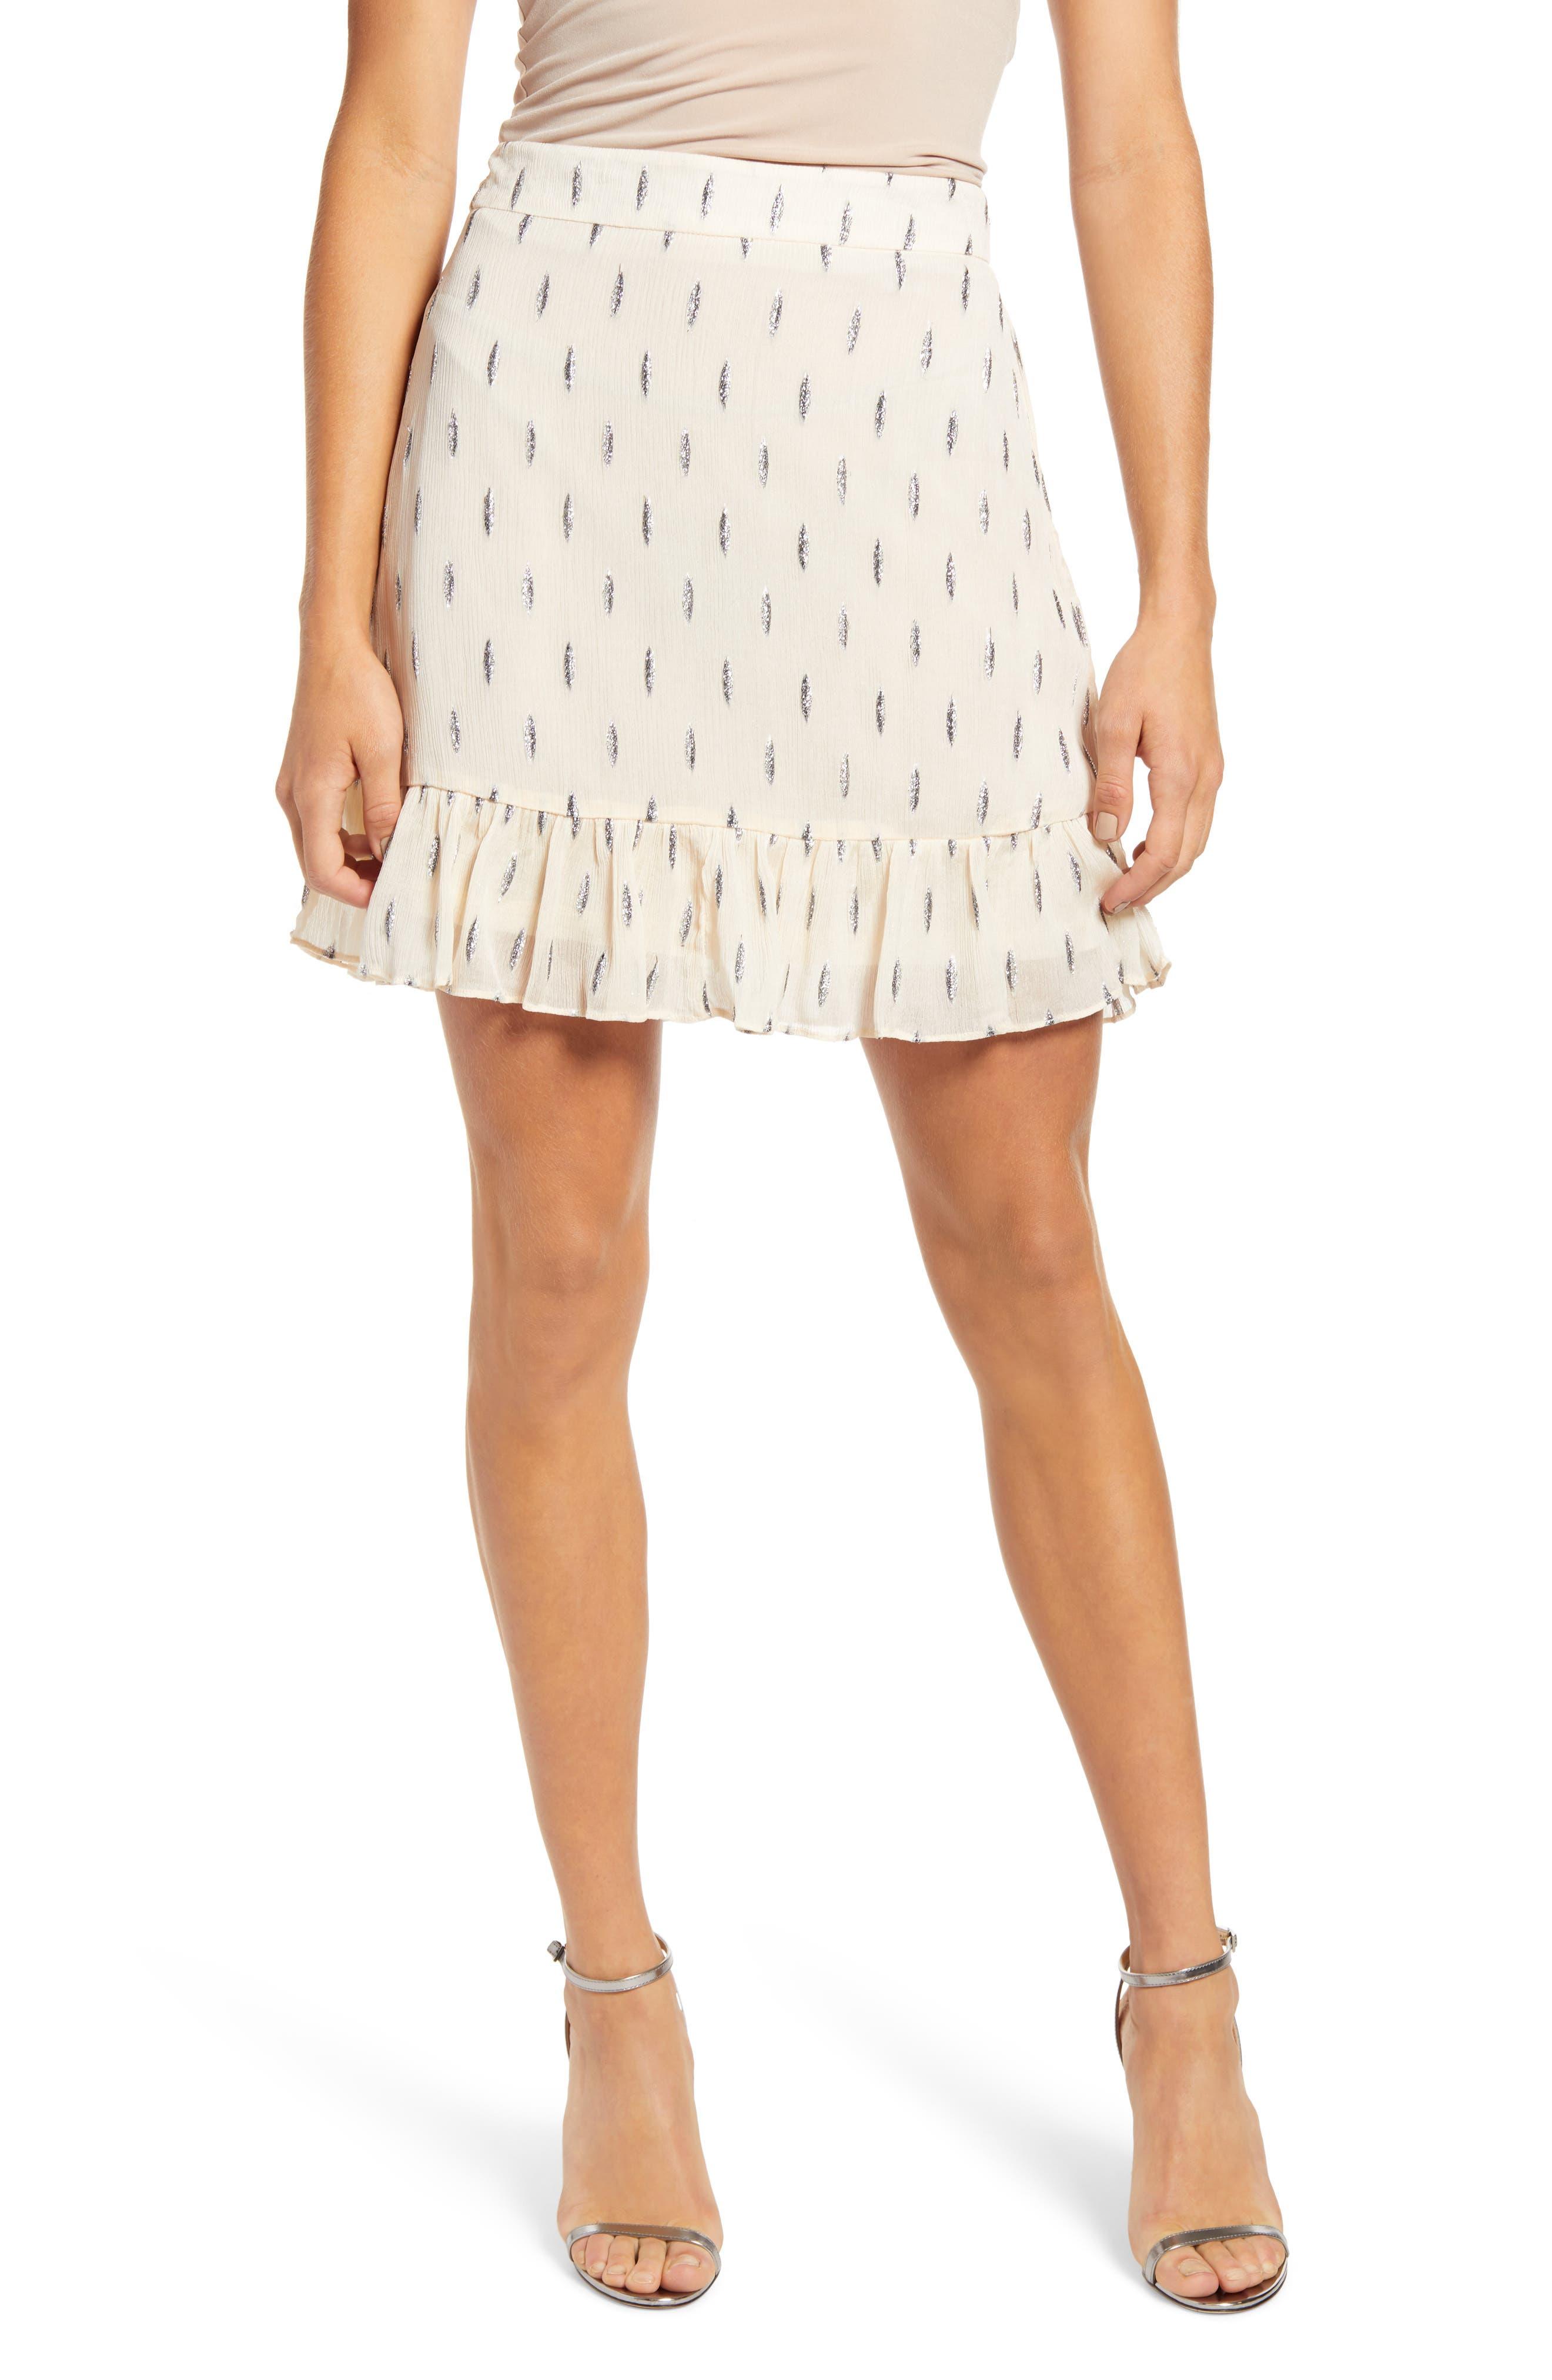 Image of VERO MODA Shimmer Layered Skirt